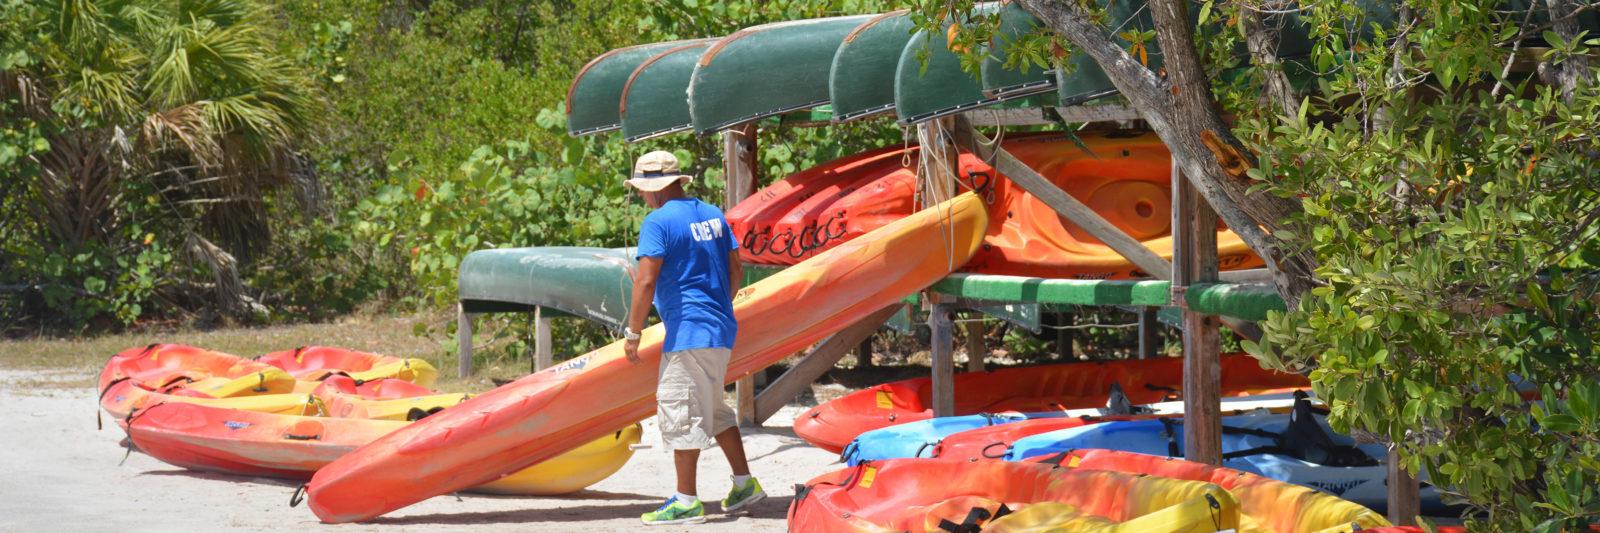 Kayak rentals Florida State Parks